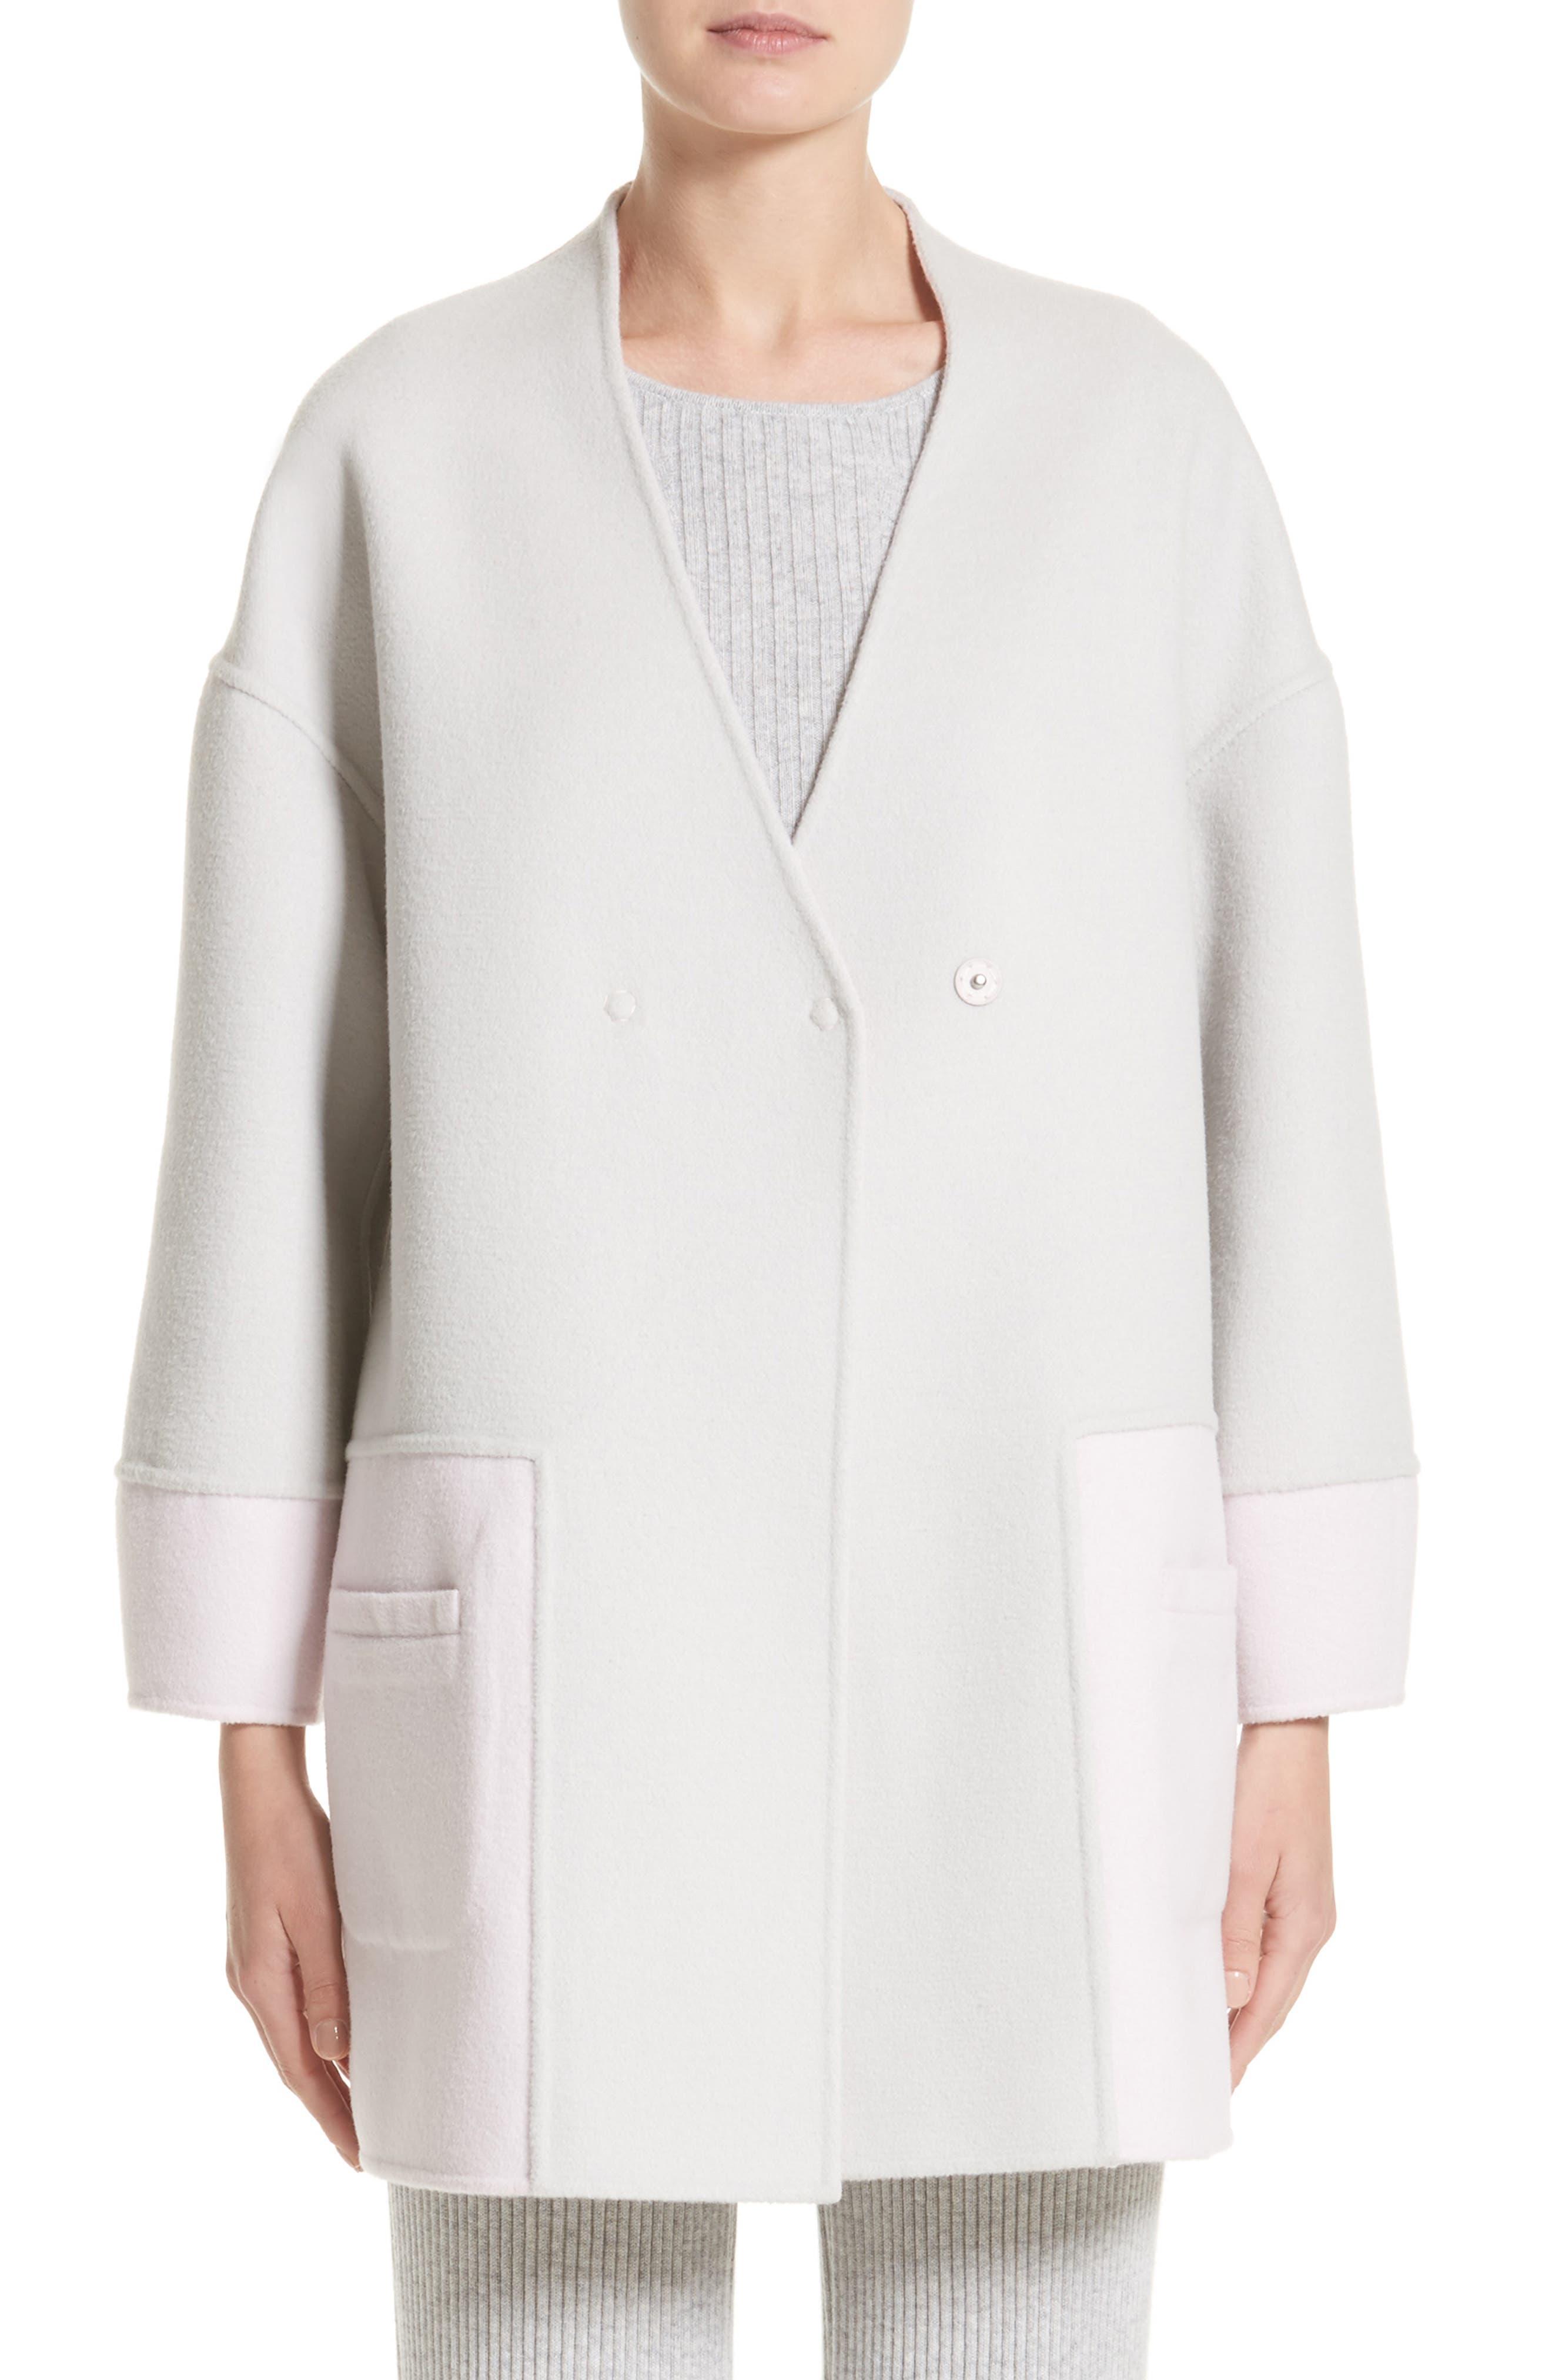 Reversible Wool Blend Cocoon Coat,                             Main thumbnail 1, color,                             Petal/ Light Grey Melange